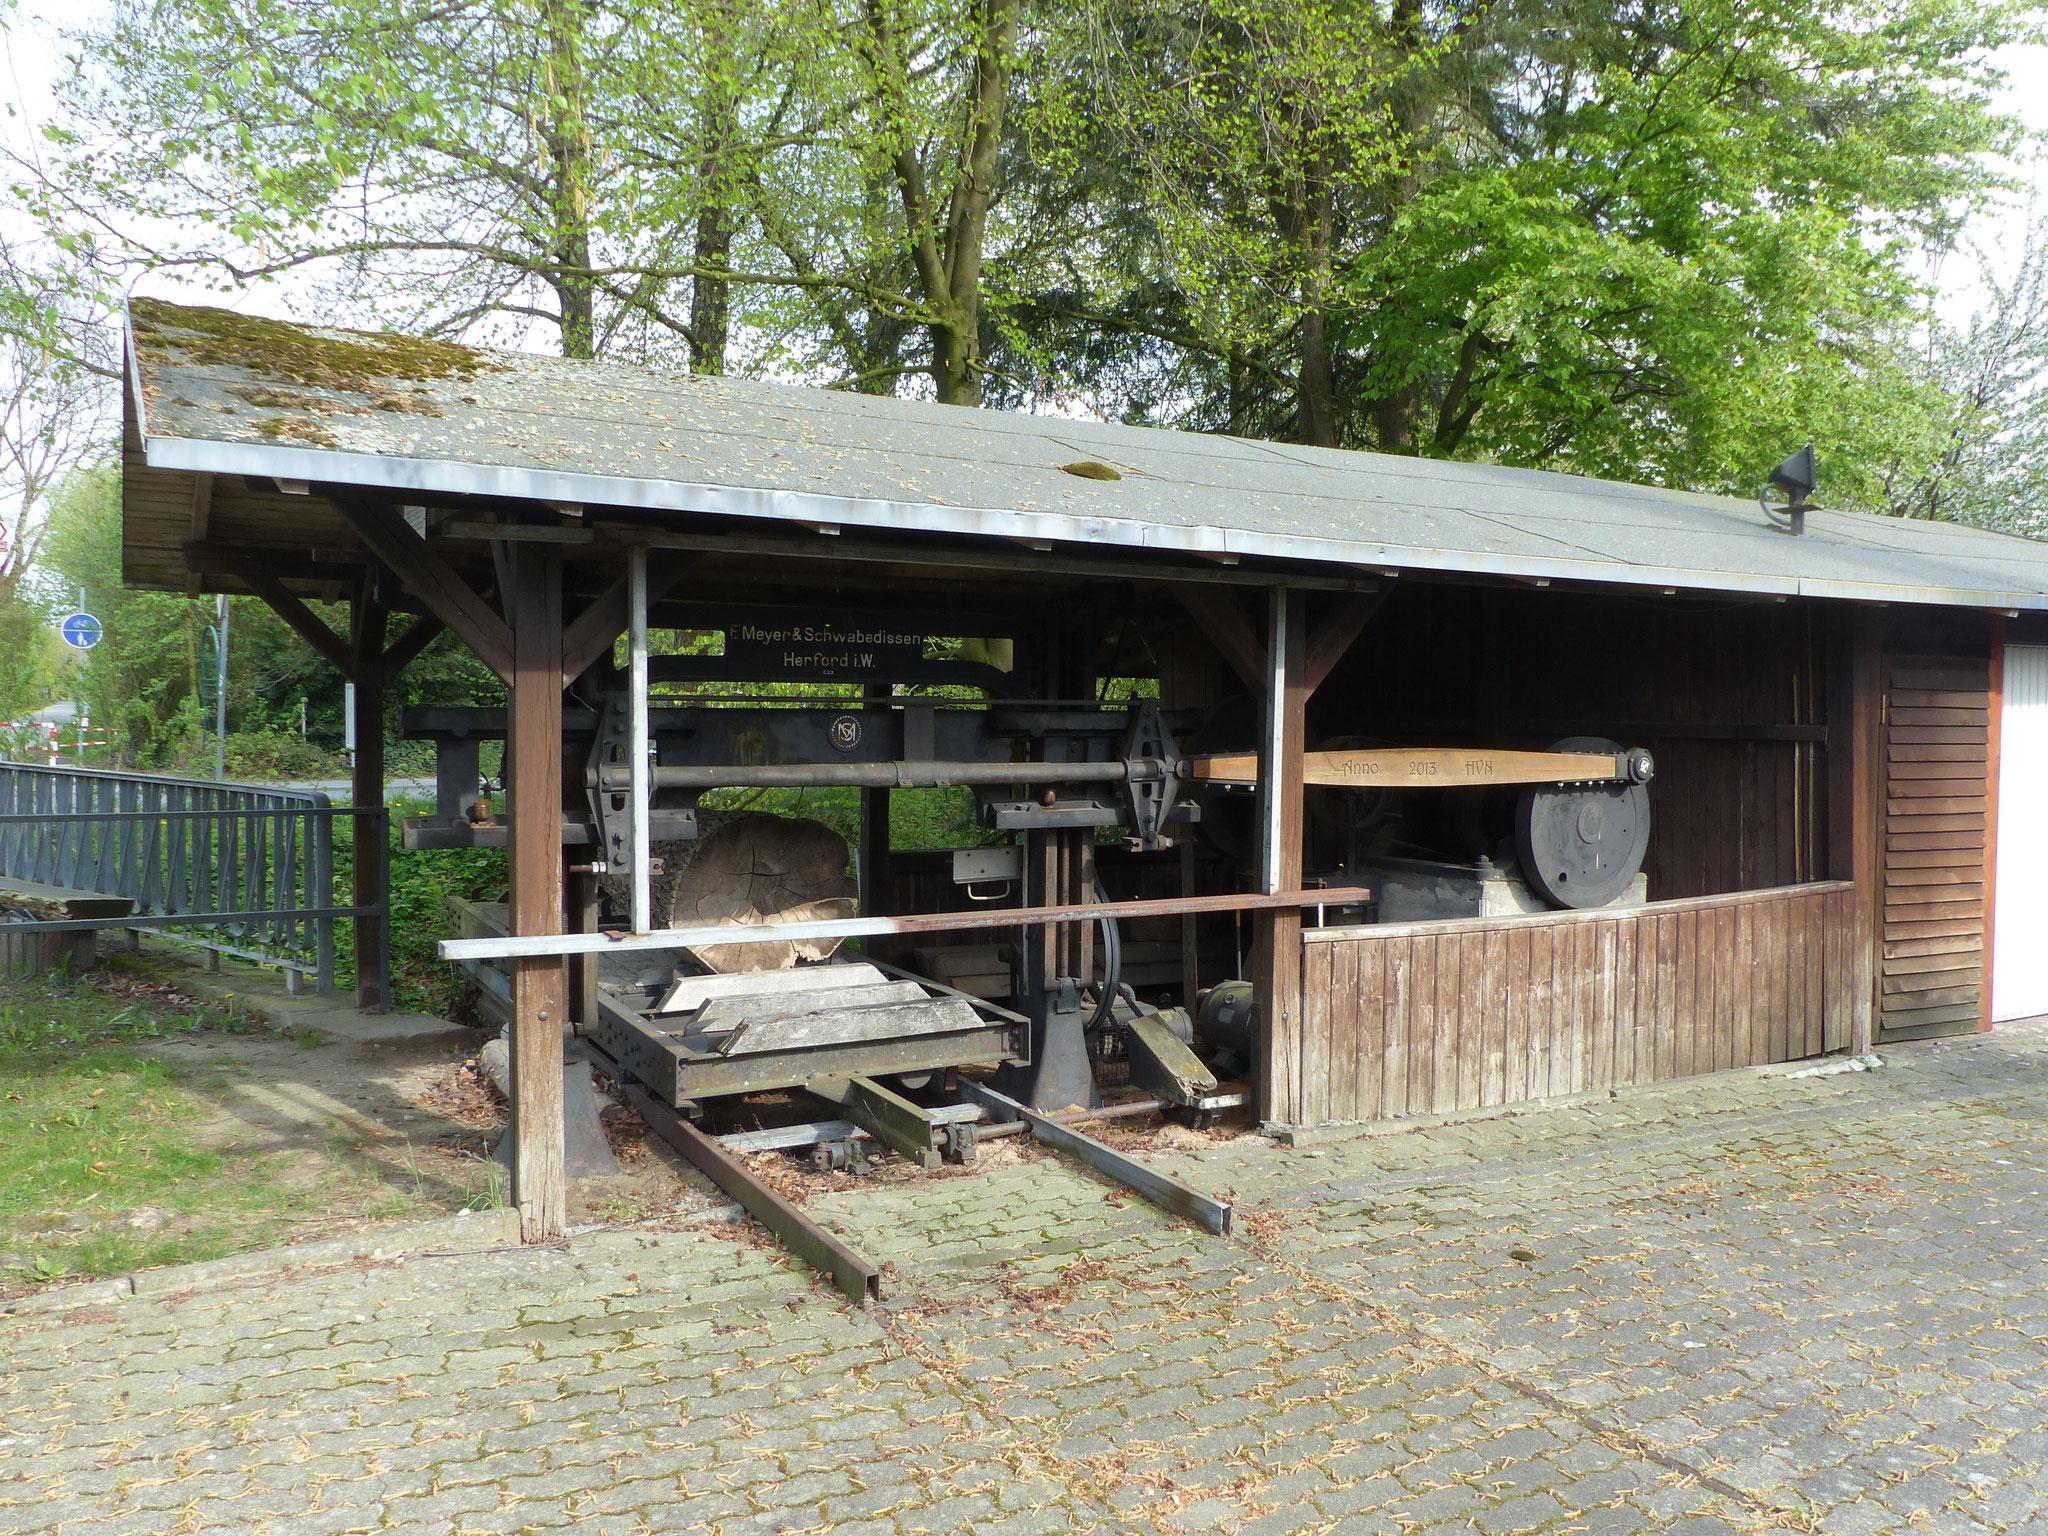 Technisches Kulturdenkmal - Renoviertes Horizontalgatter am Möhnetalradweg